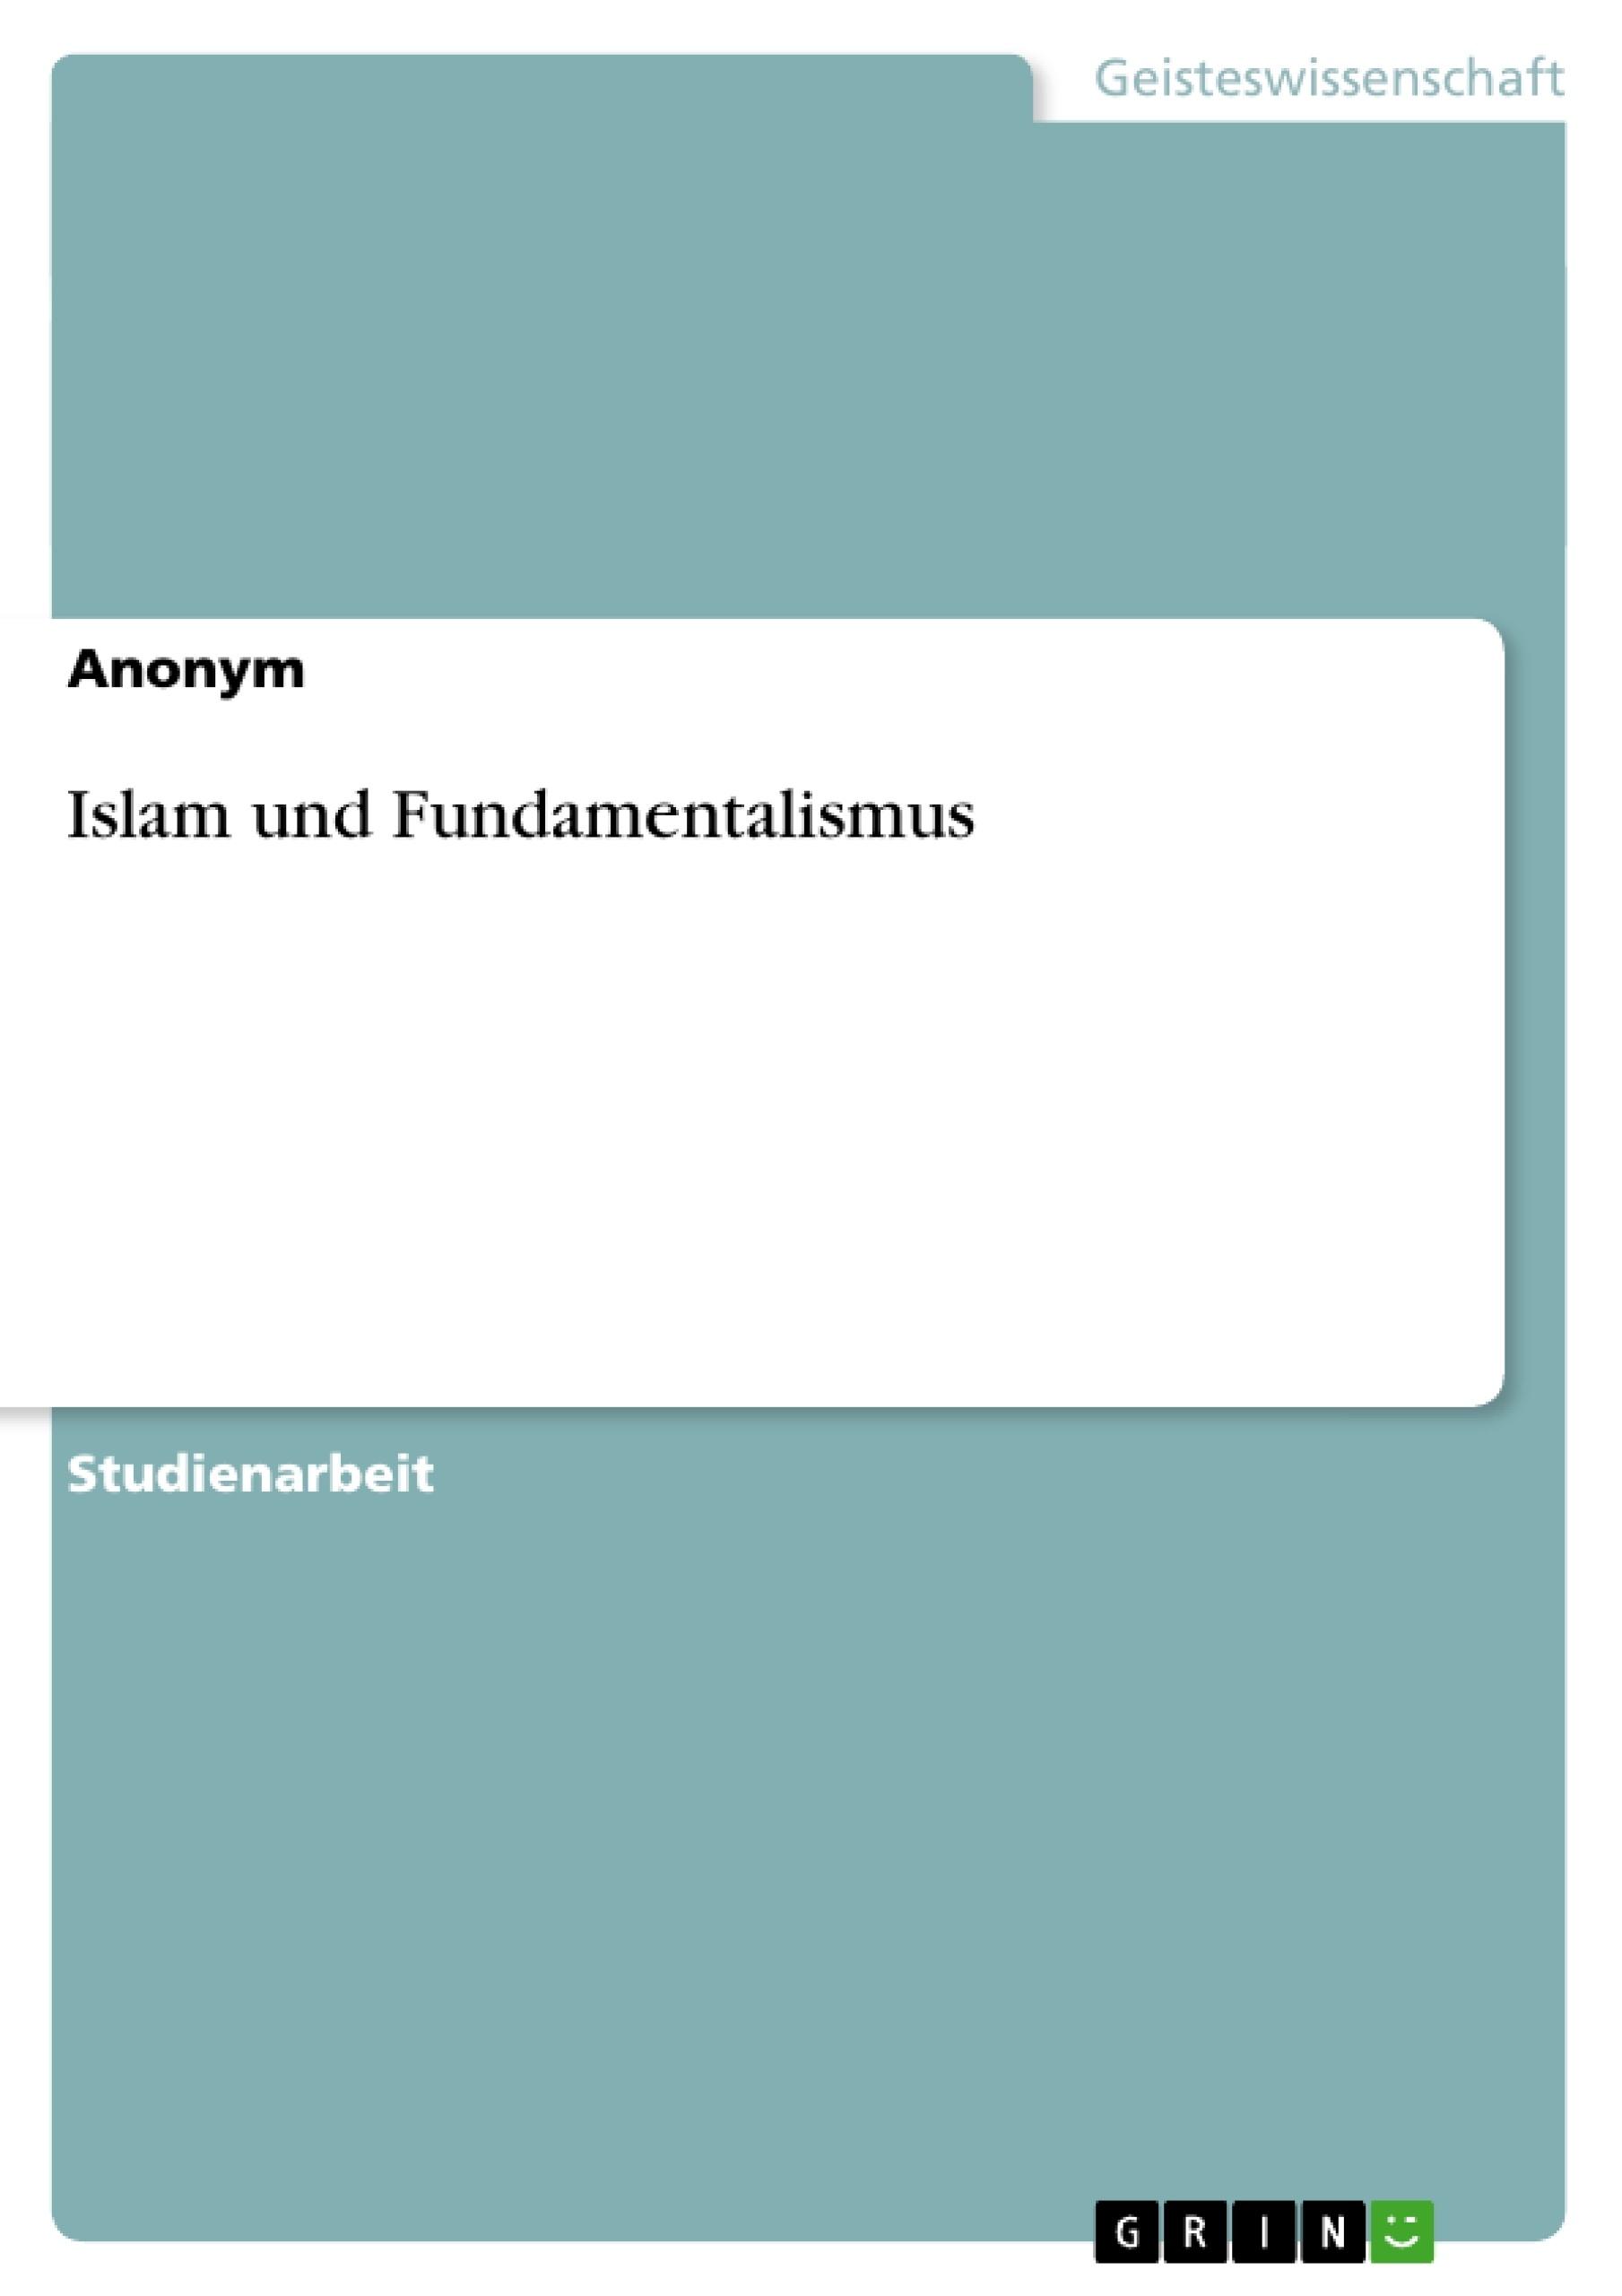 Titel: Islam und Fundamentalismus